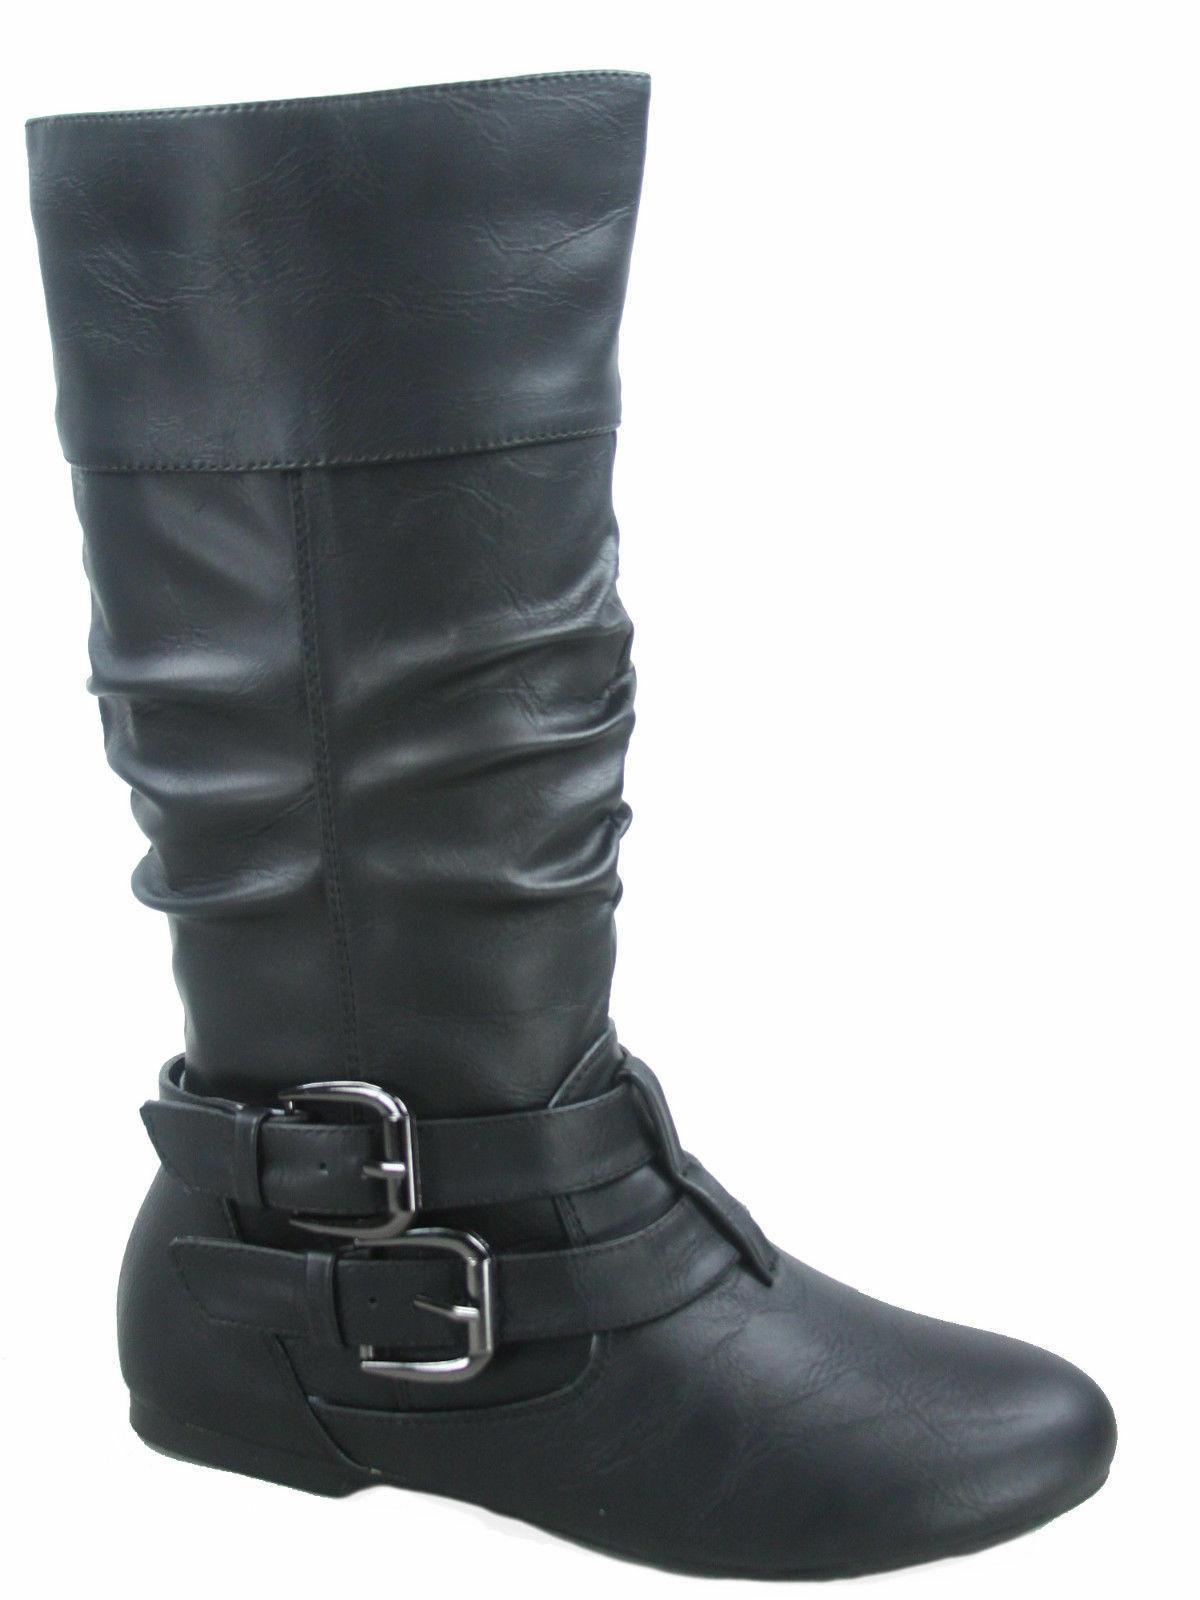 Women's Toe Flat Buckle Boots 5 - 11 NEW